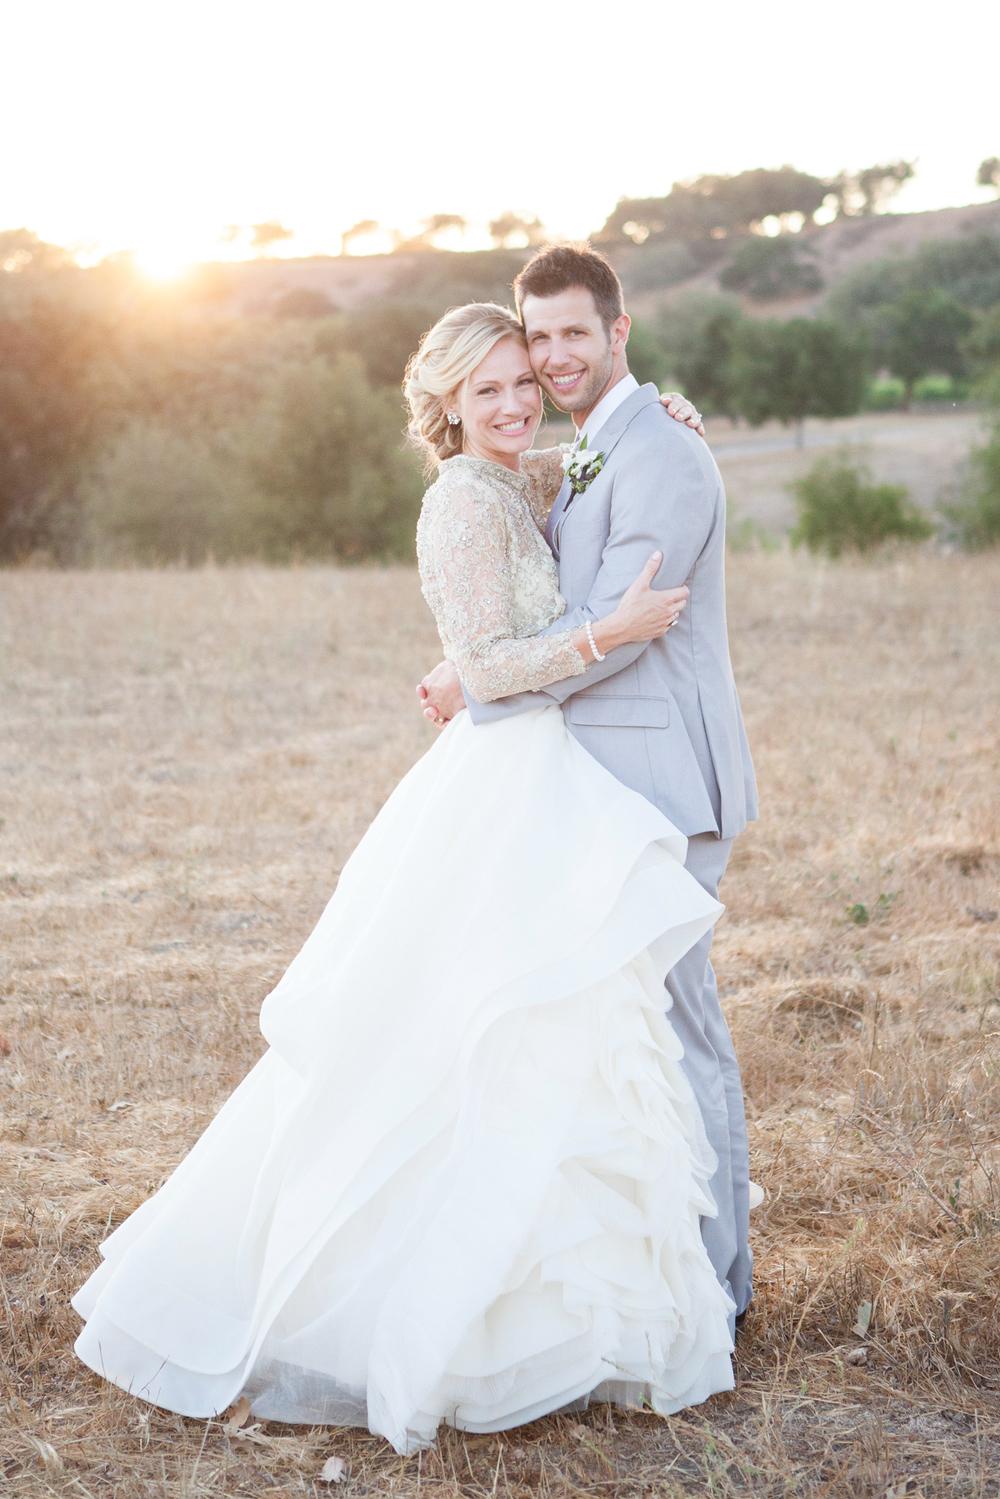 Dani and Chris- Crossroads Estate wedding ©Skyla Walton (115 of 126).jpg